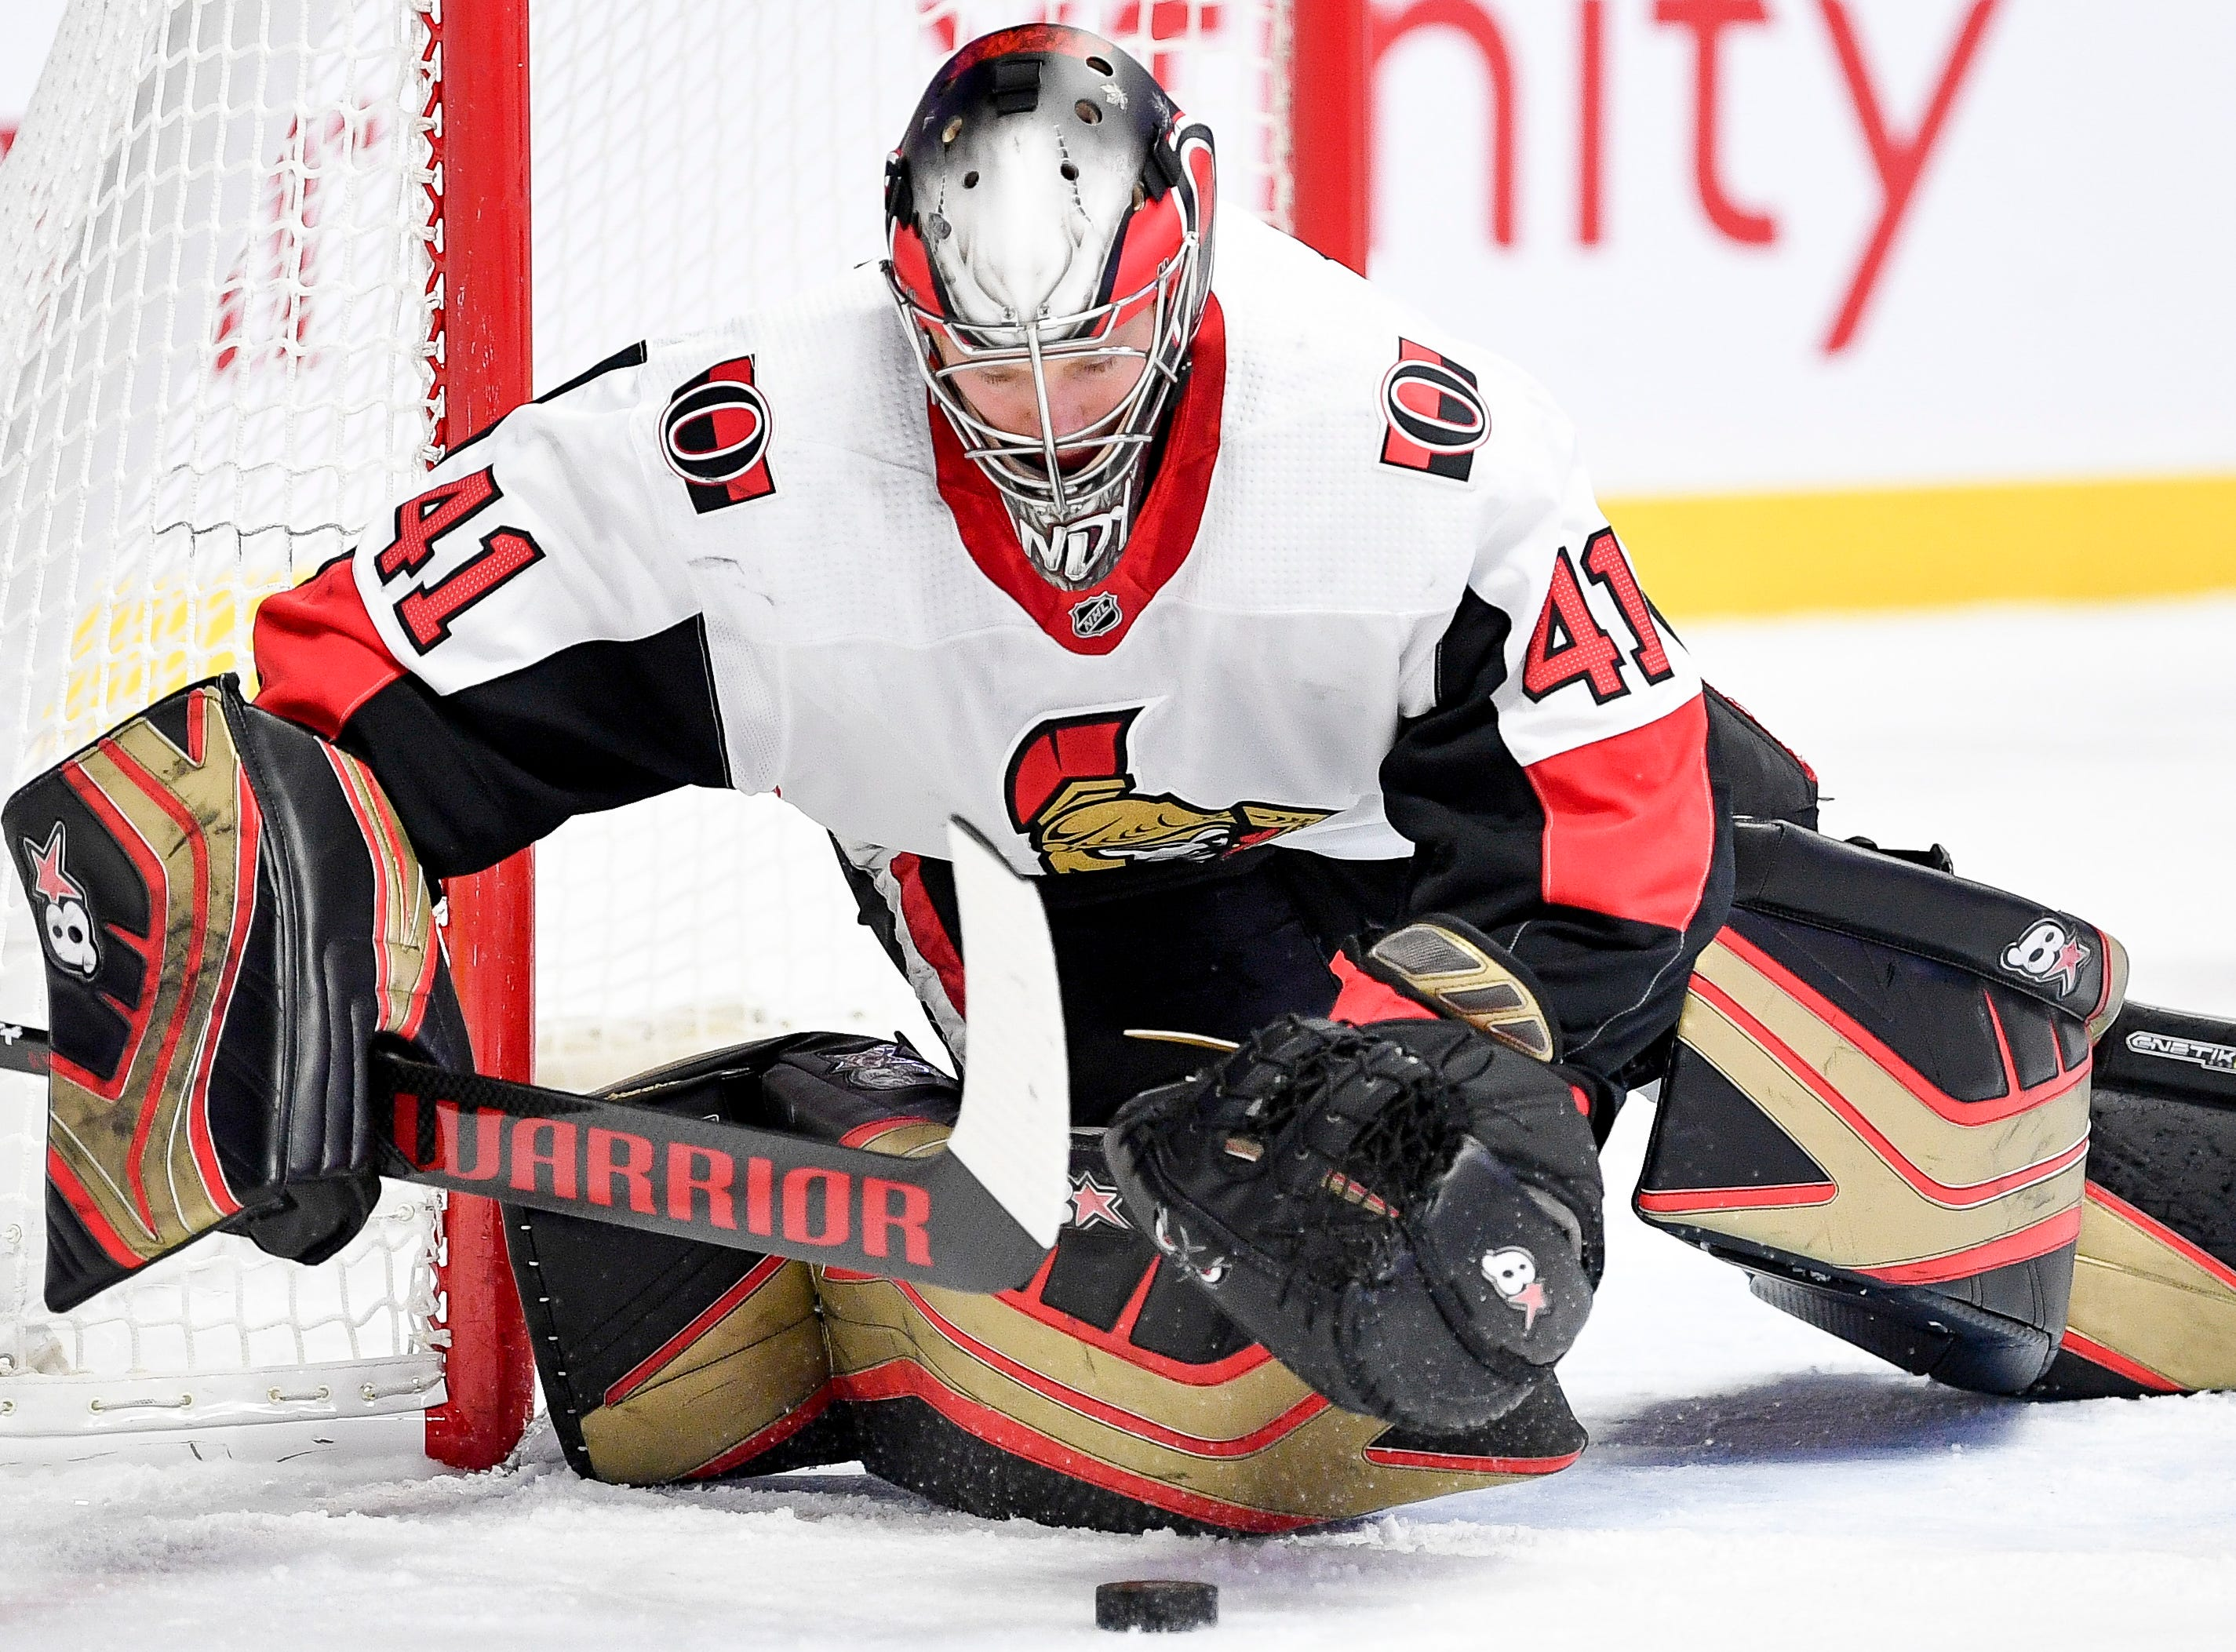 Ottawa Senators goaltender Craig Anderson (41) defends against the Nashville Predators during the first period at Bridgestone Arena in Nashville, Tenn., Tuesday, Dec. 11, 2018.